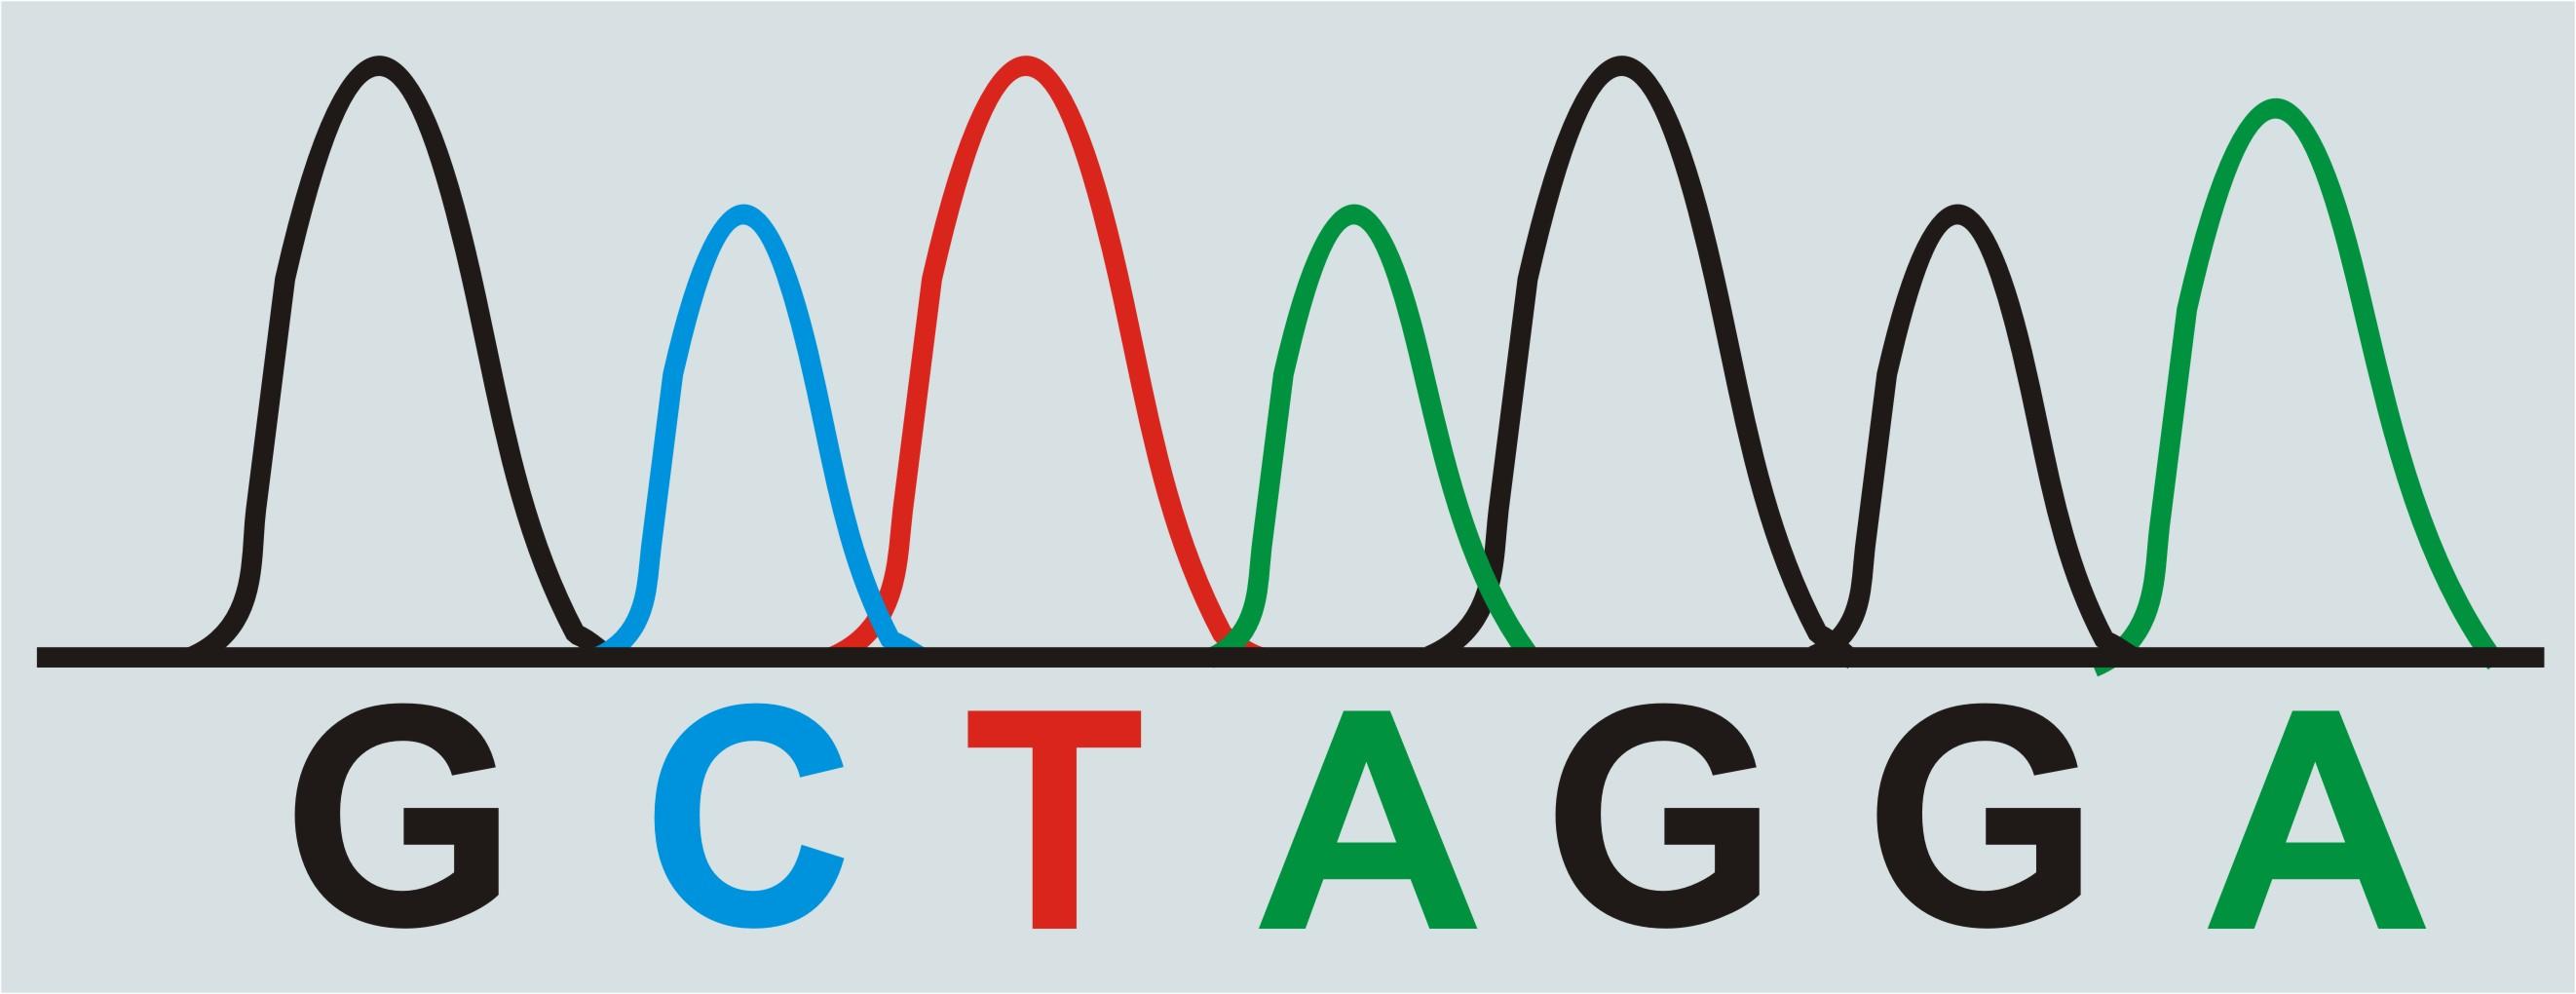 CMarZ - DNA Barcoding